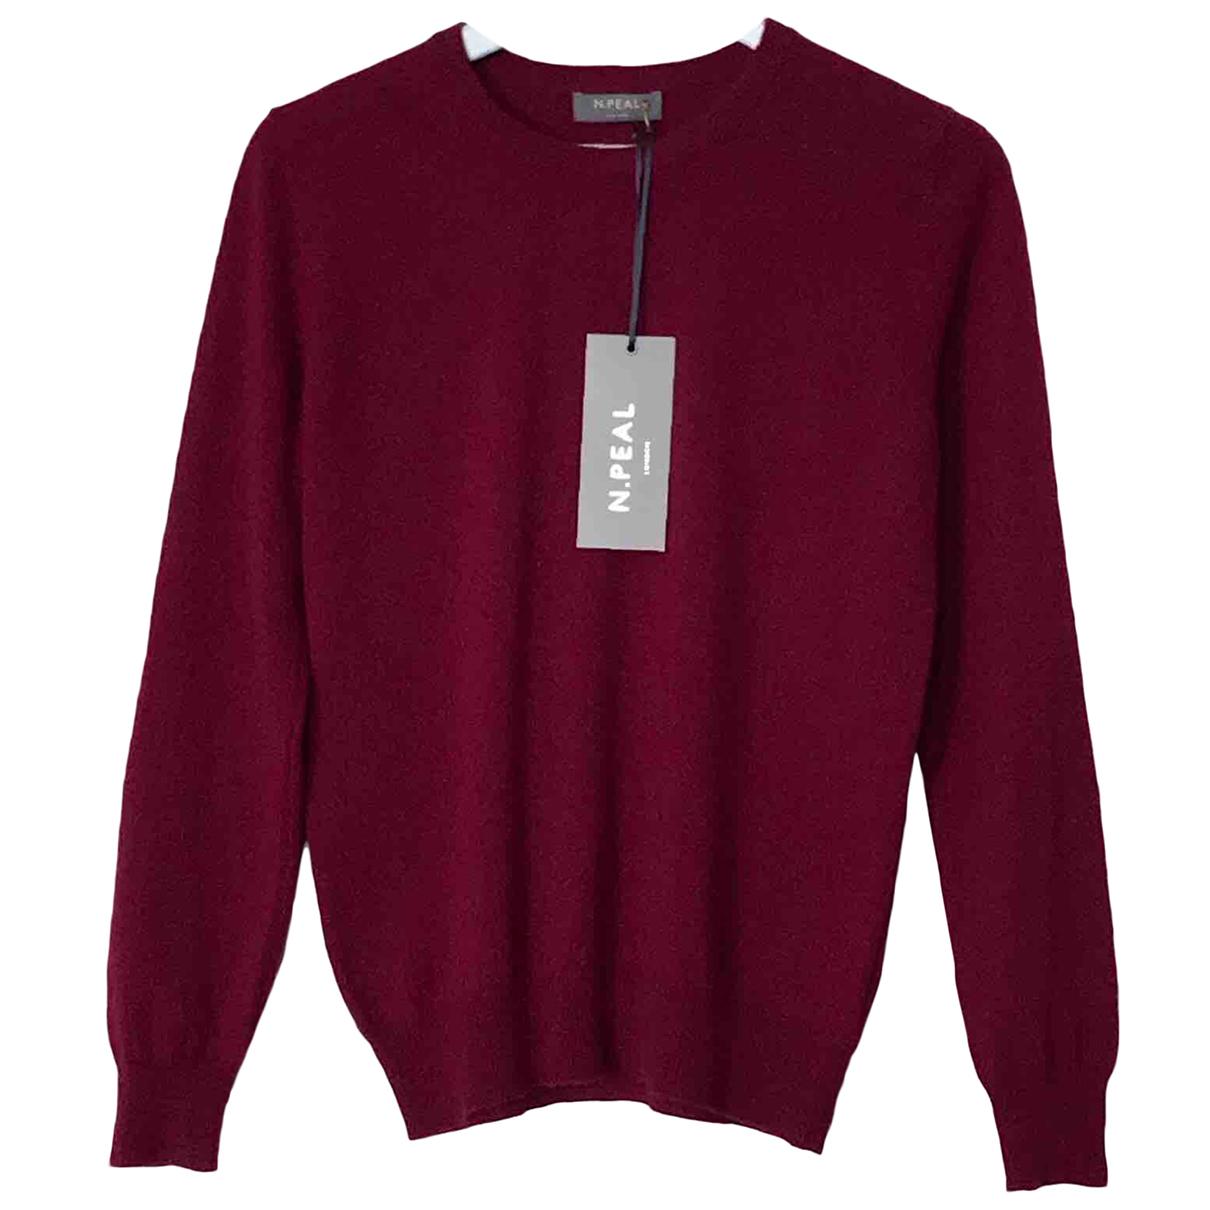 N. Peal N Burgundy Cashmere Knitwear for Women S International